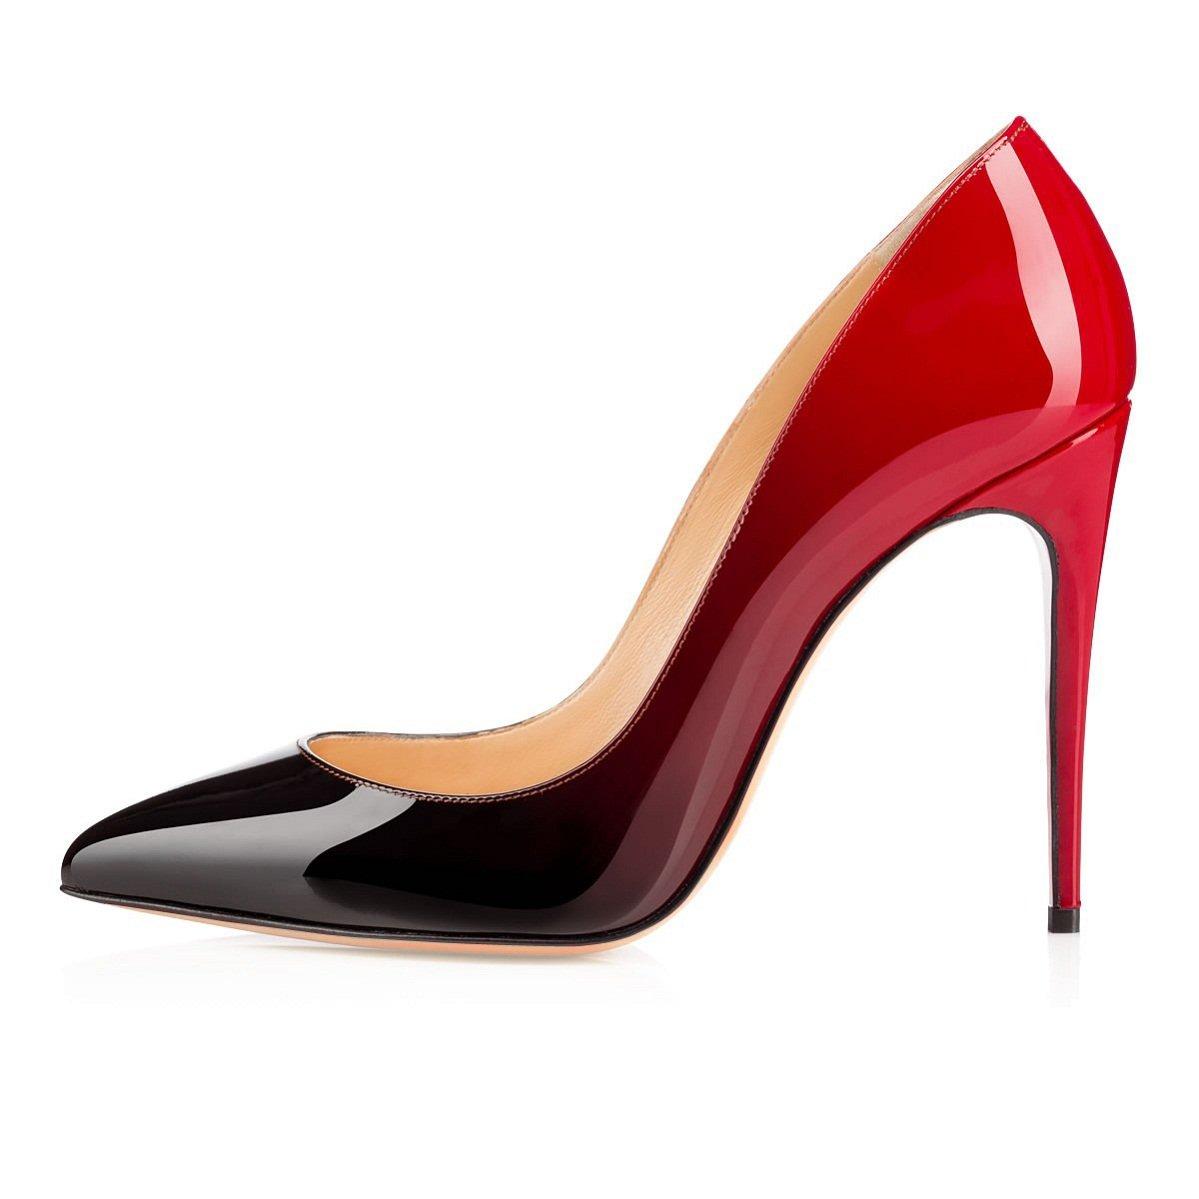 EDEFS - Scarpe col tacco donna - Classico Scarpe col Tacco - Sexy High Heels Gradient